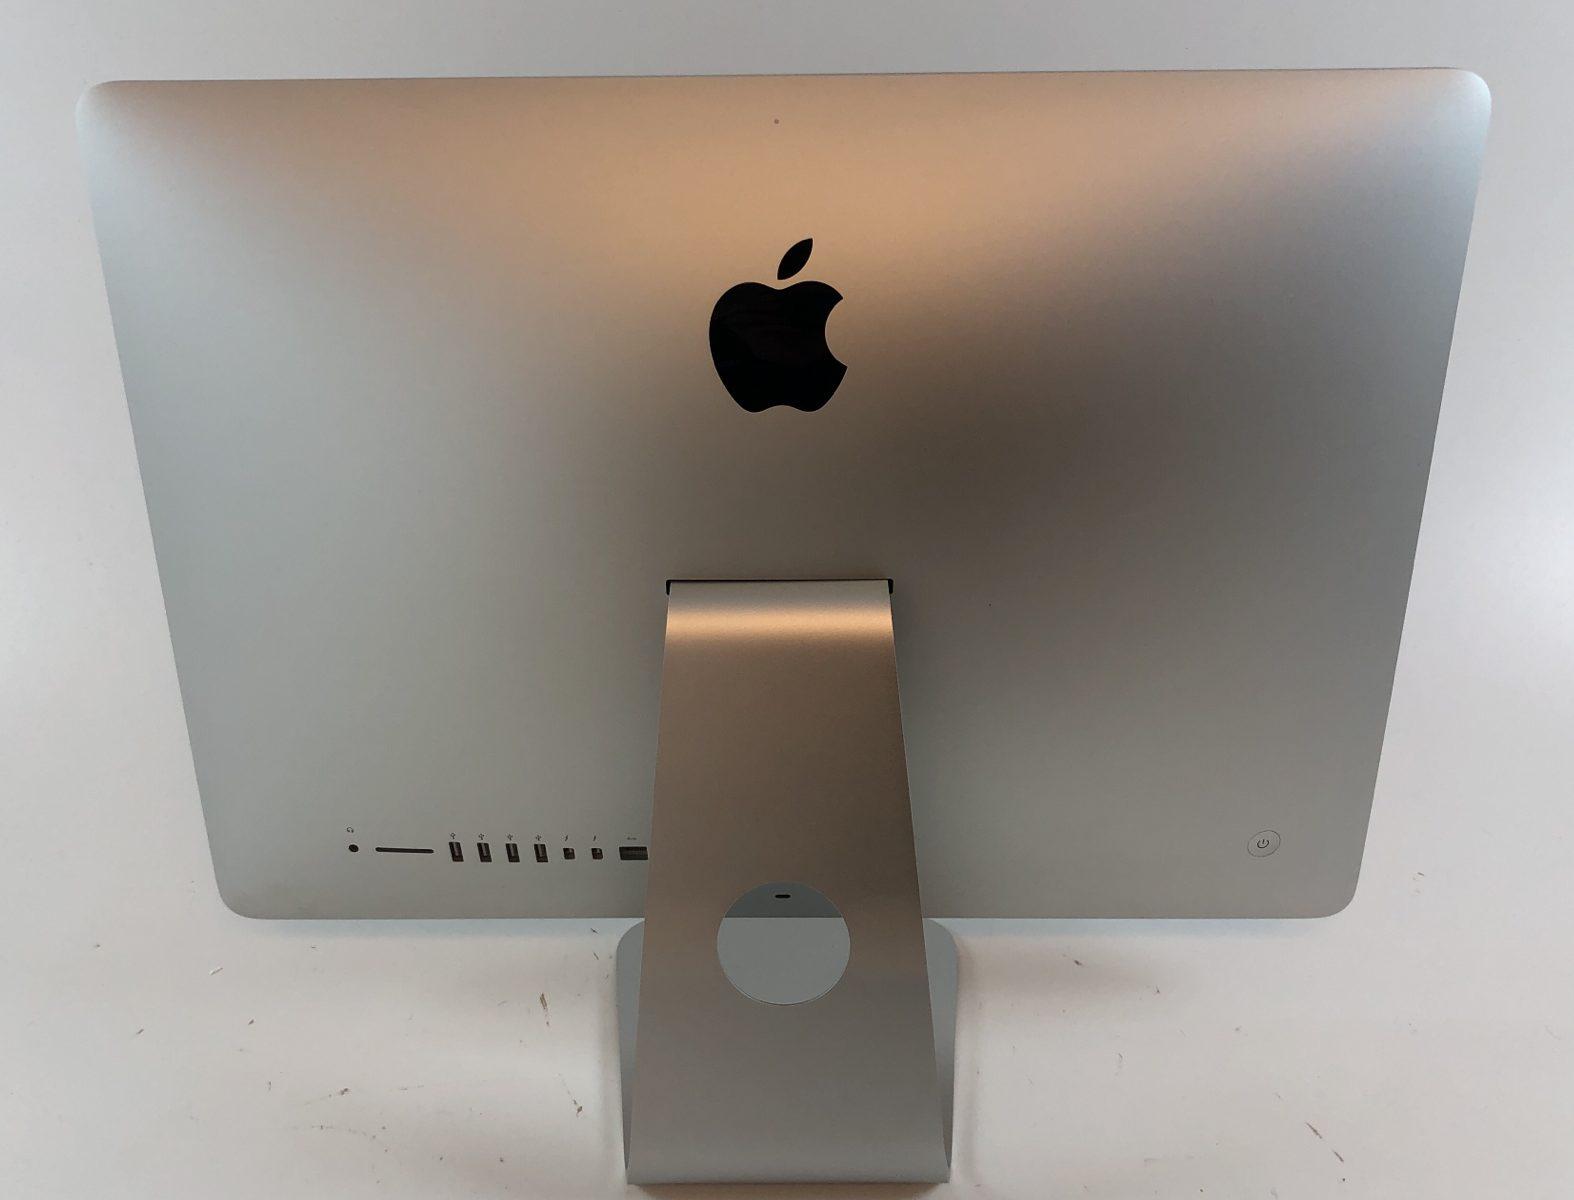 "iMac 21.5"" Late 2013 (Intel Quad-Core i5 2.9 GHz 8 GB RAM 1 TB Fusion Drive), Intel Quad-Core i5 2.9 GHz, 8 GB RAM, 1 TB Fusion Drive, bild 2"